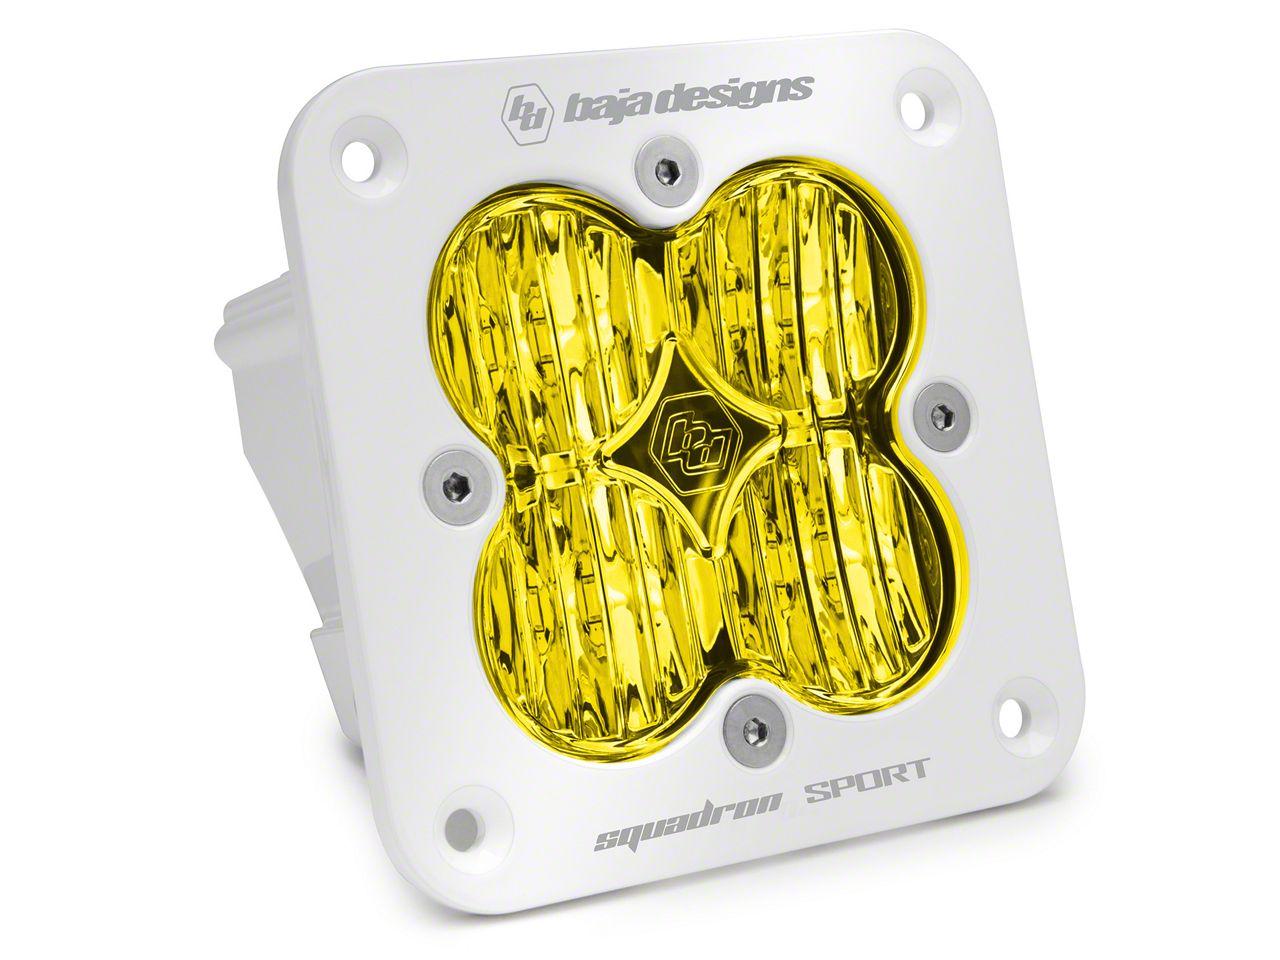 Baja Designs Squadron Sport Amber/White Flush Mount LED Light - Wide Cornering Beam